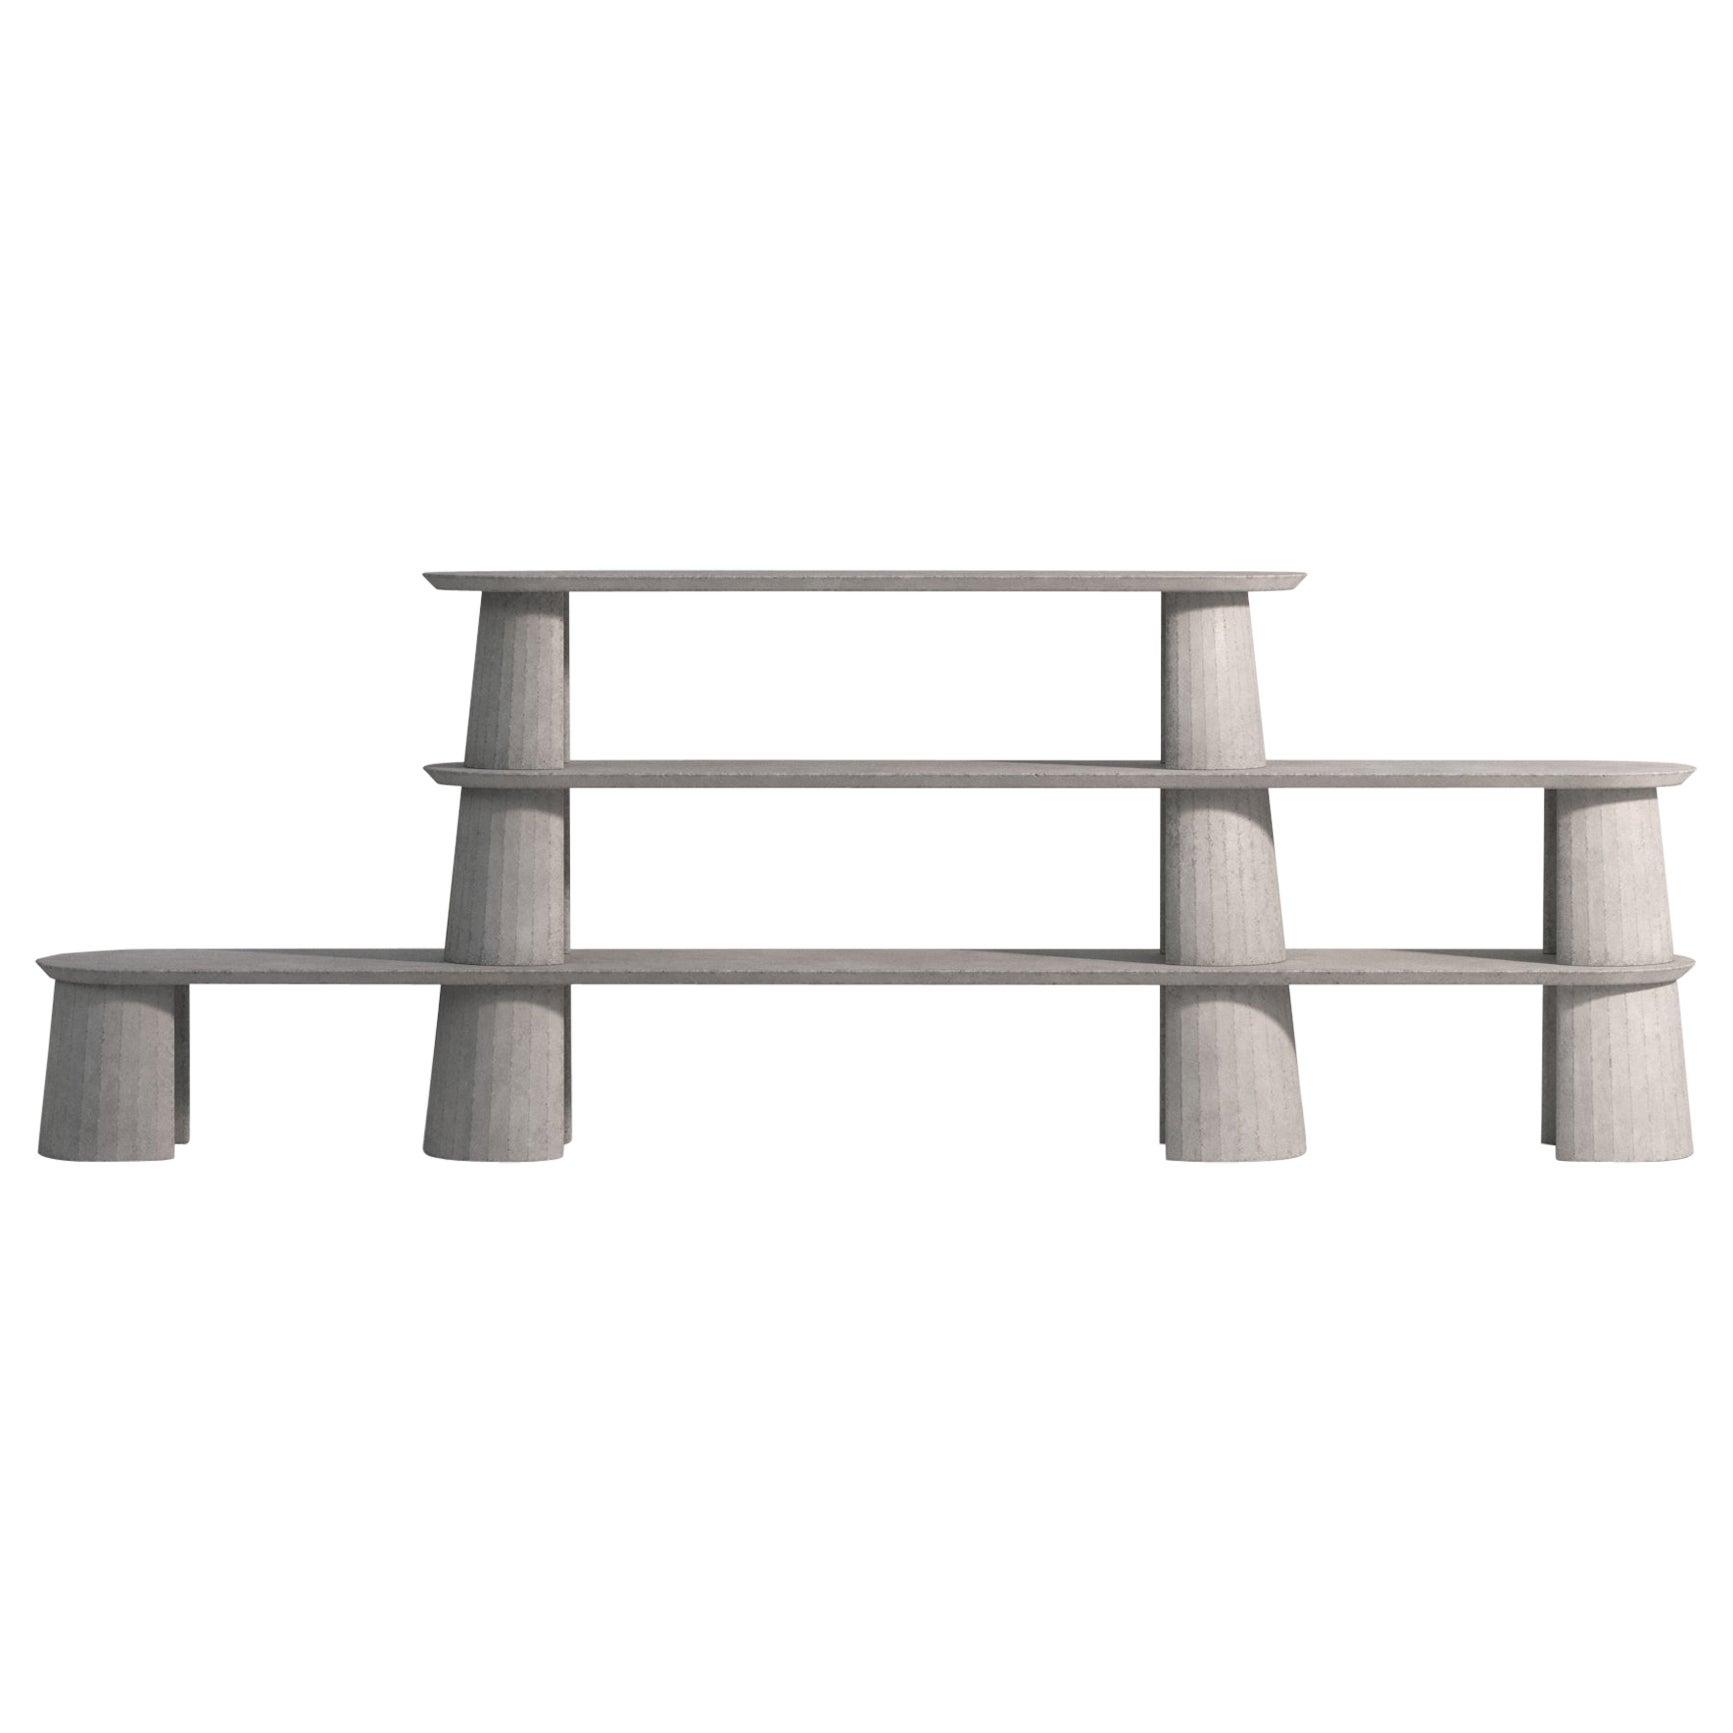 21st Century Studio Irvine Fusto Bookcase Mod.I Concrete Bookshelf Grey Cement